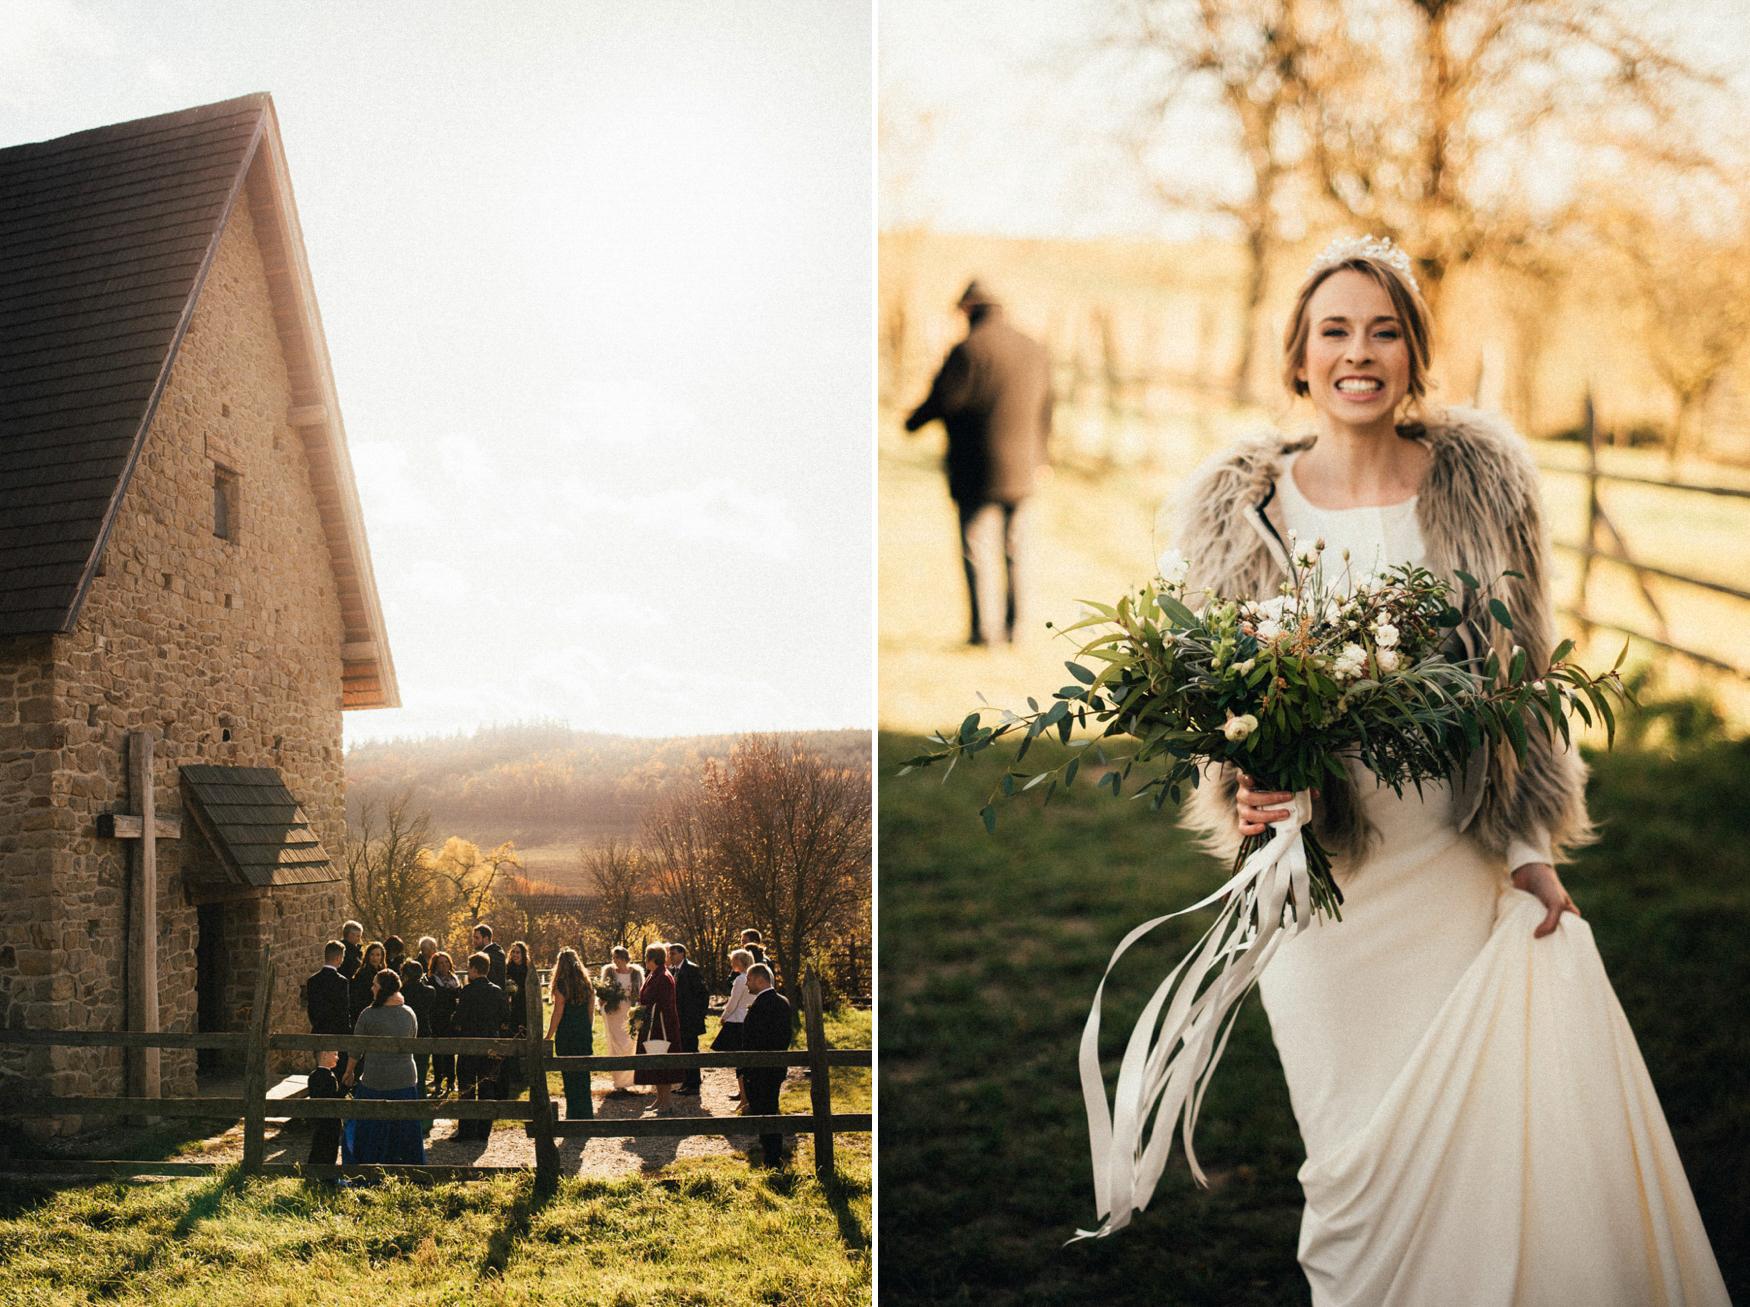 2 prague wedding photographer - boho svatba zikmundov005.jpg